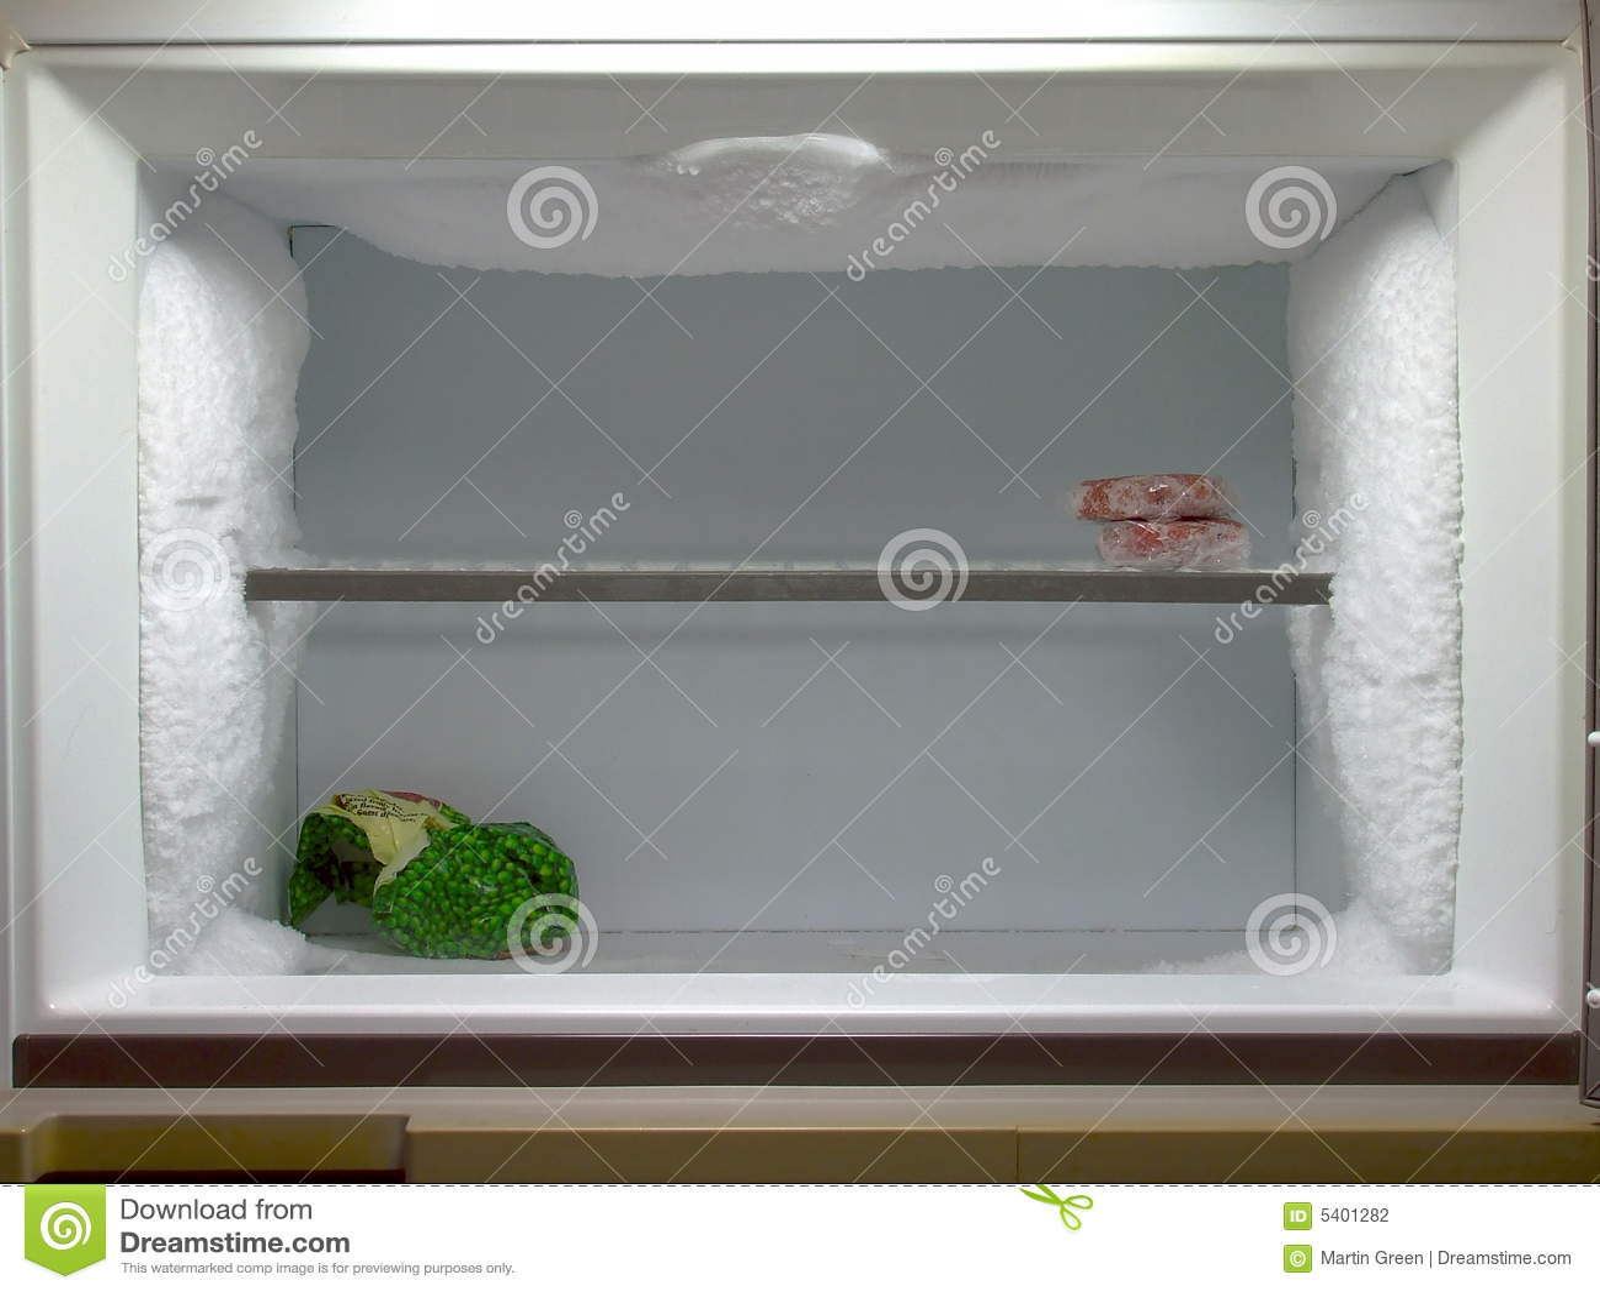 Freezer Needs Defrosting